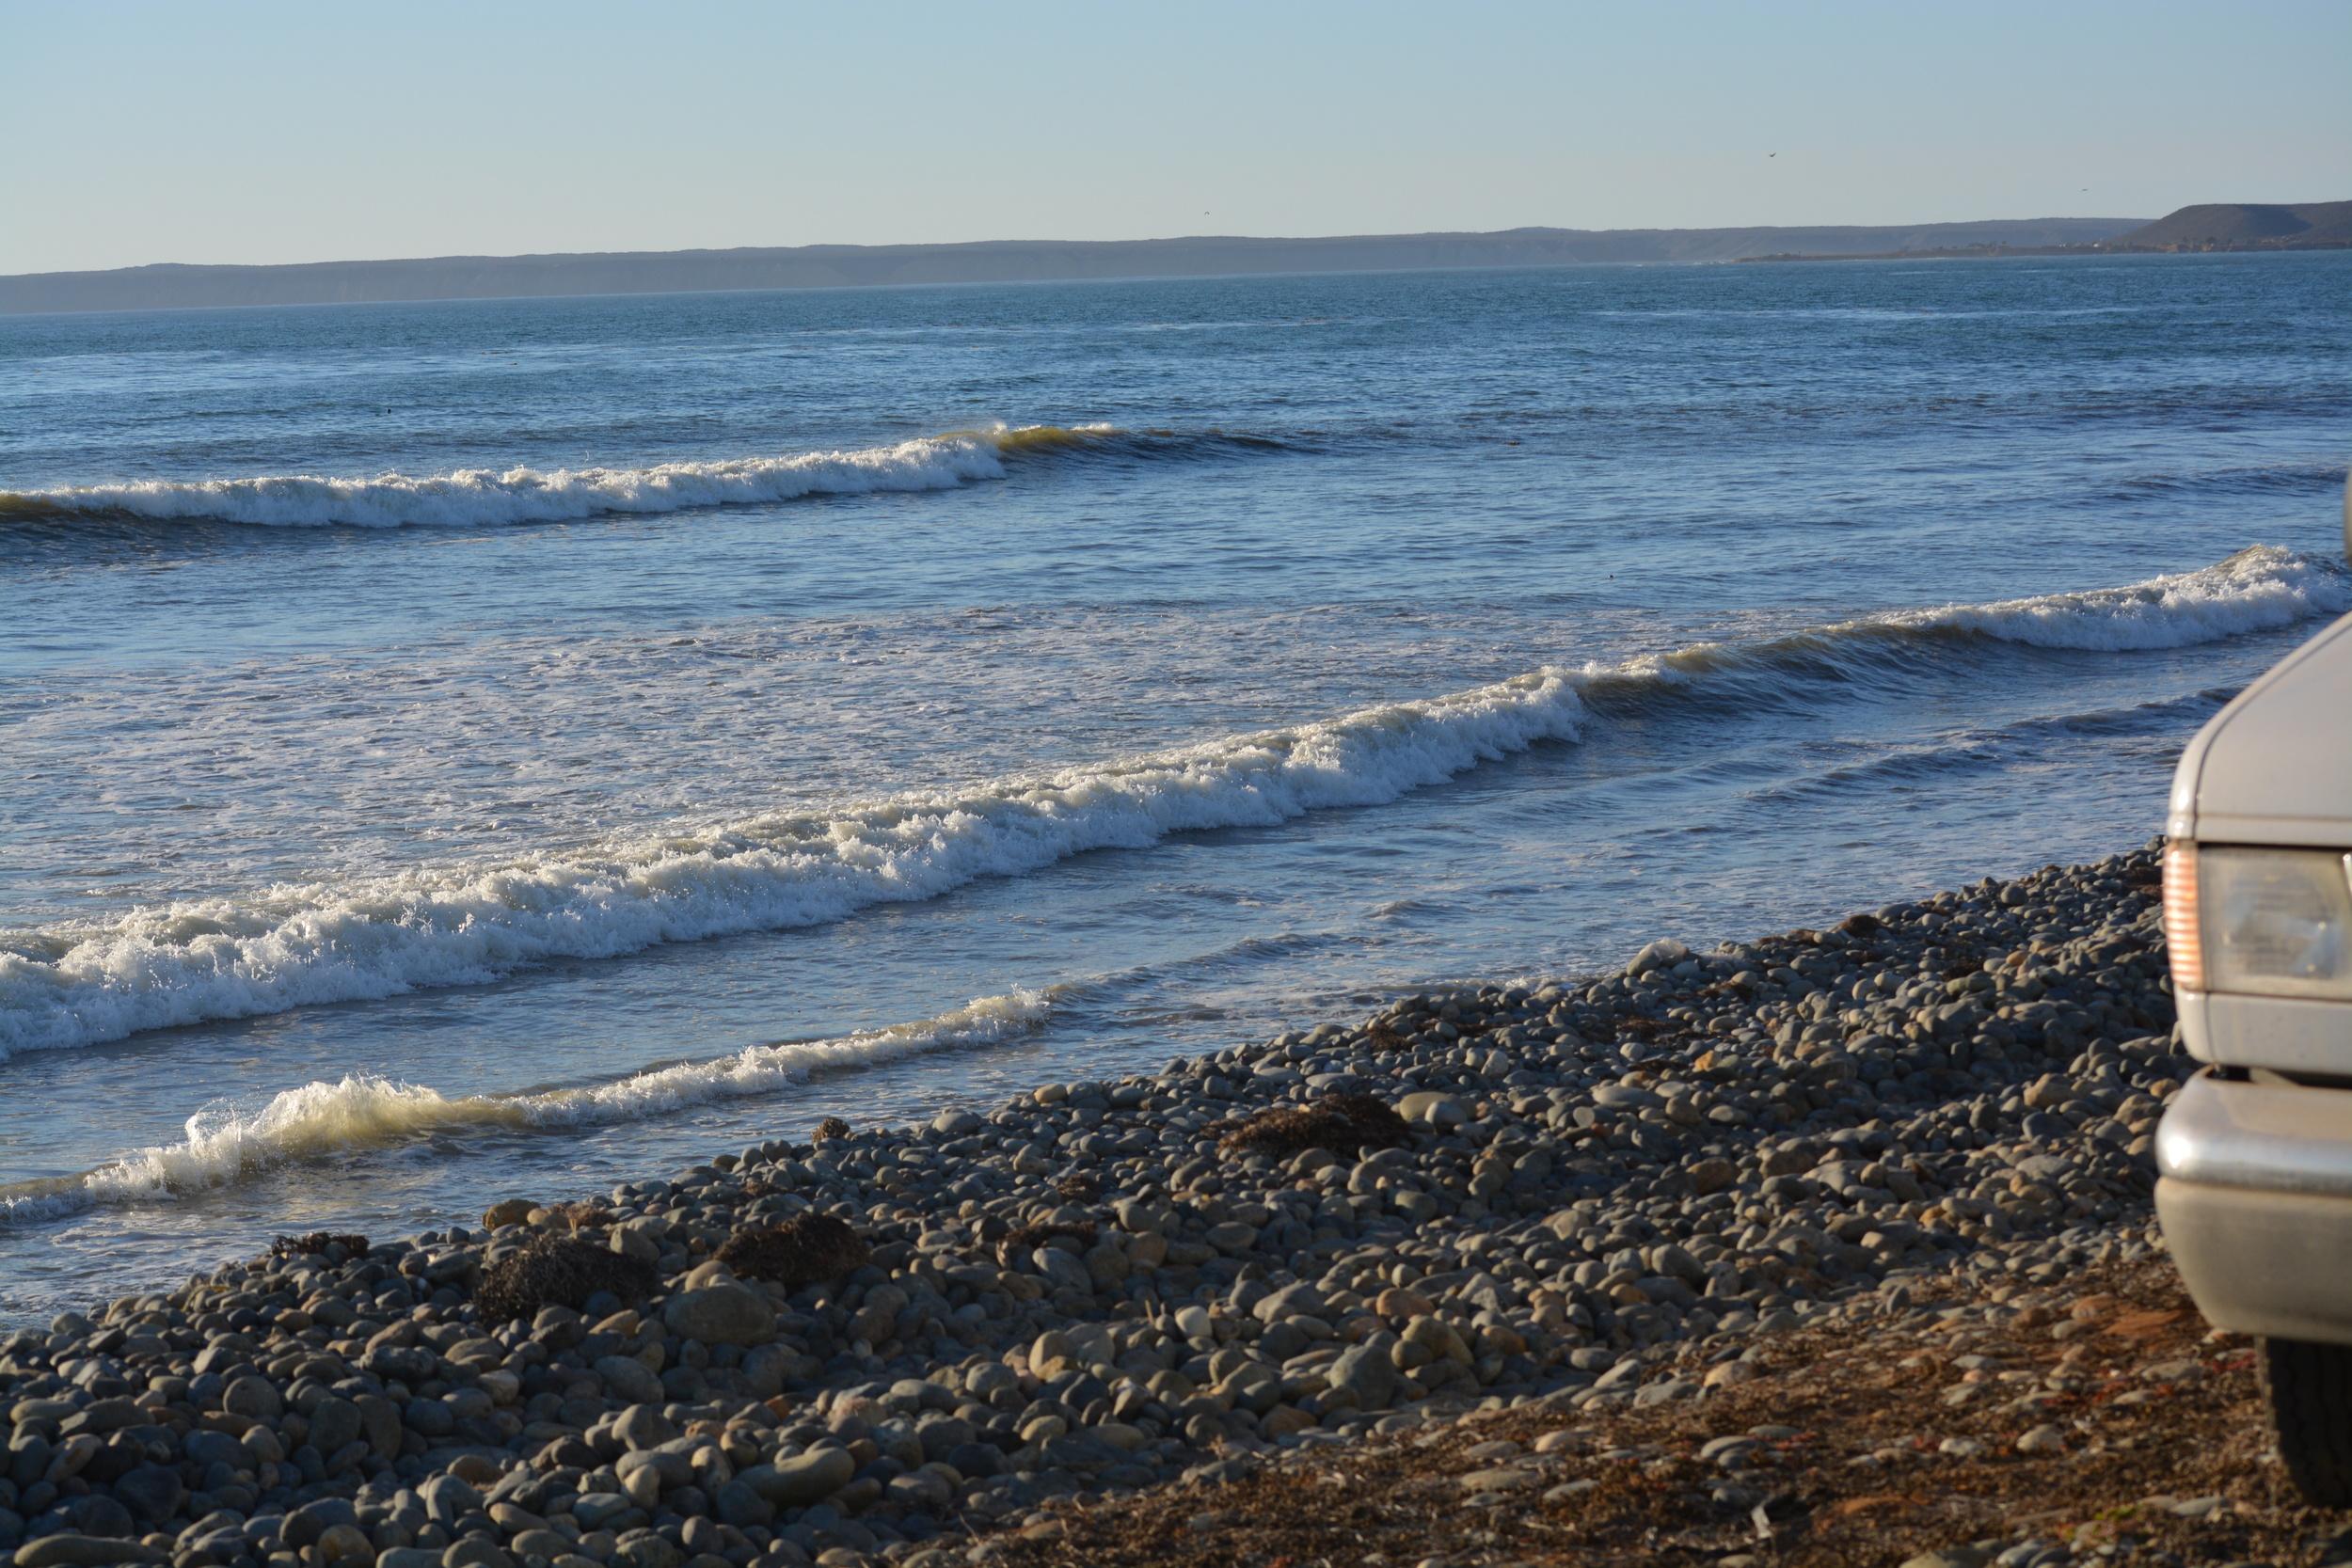 Baja California 10-5-13 Shipwrecks Surfing Adventure Ocean Experience Surf School San Diego (90).JPG